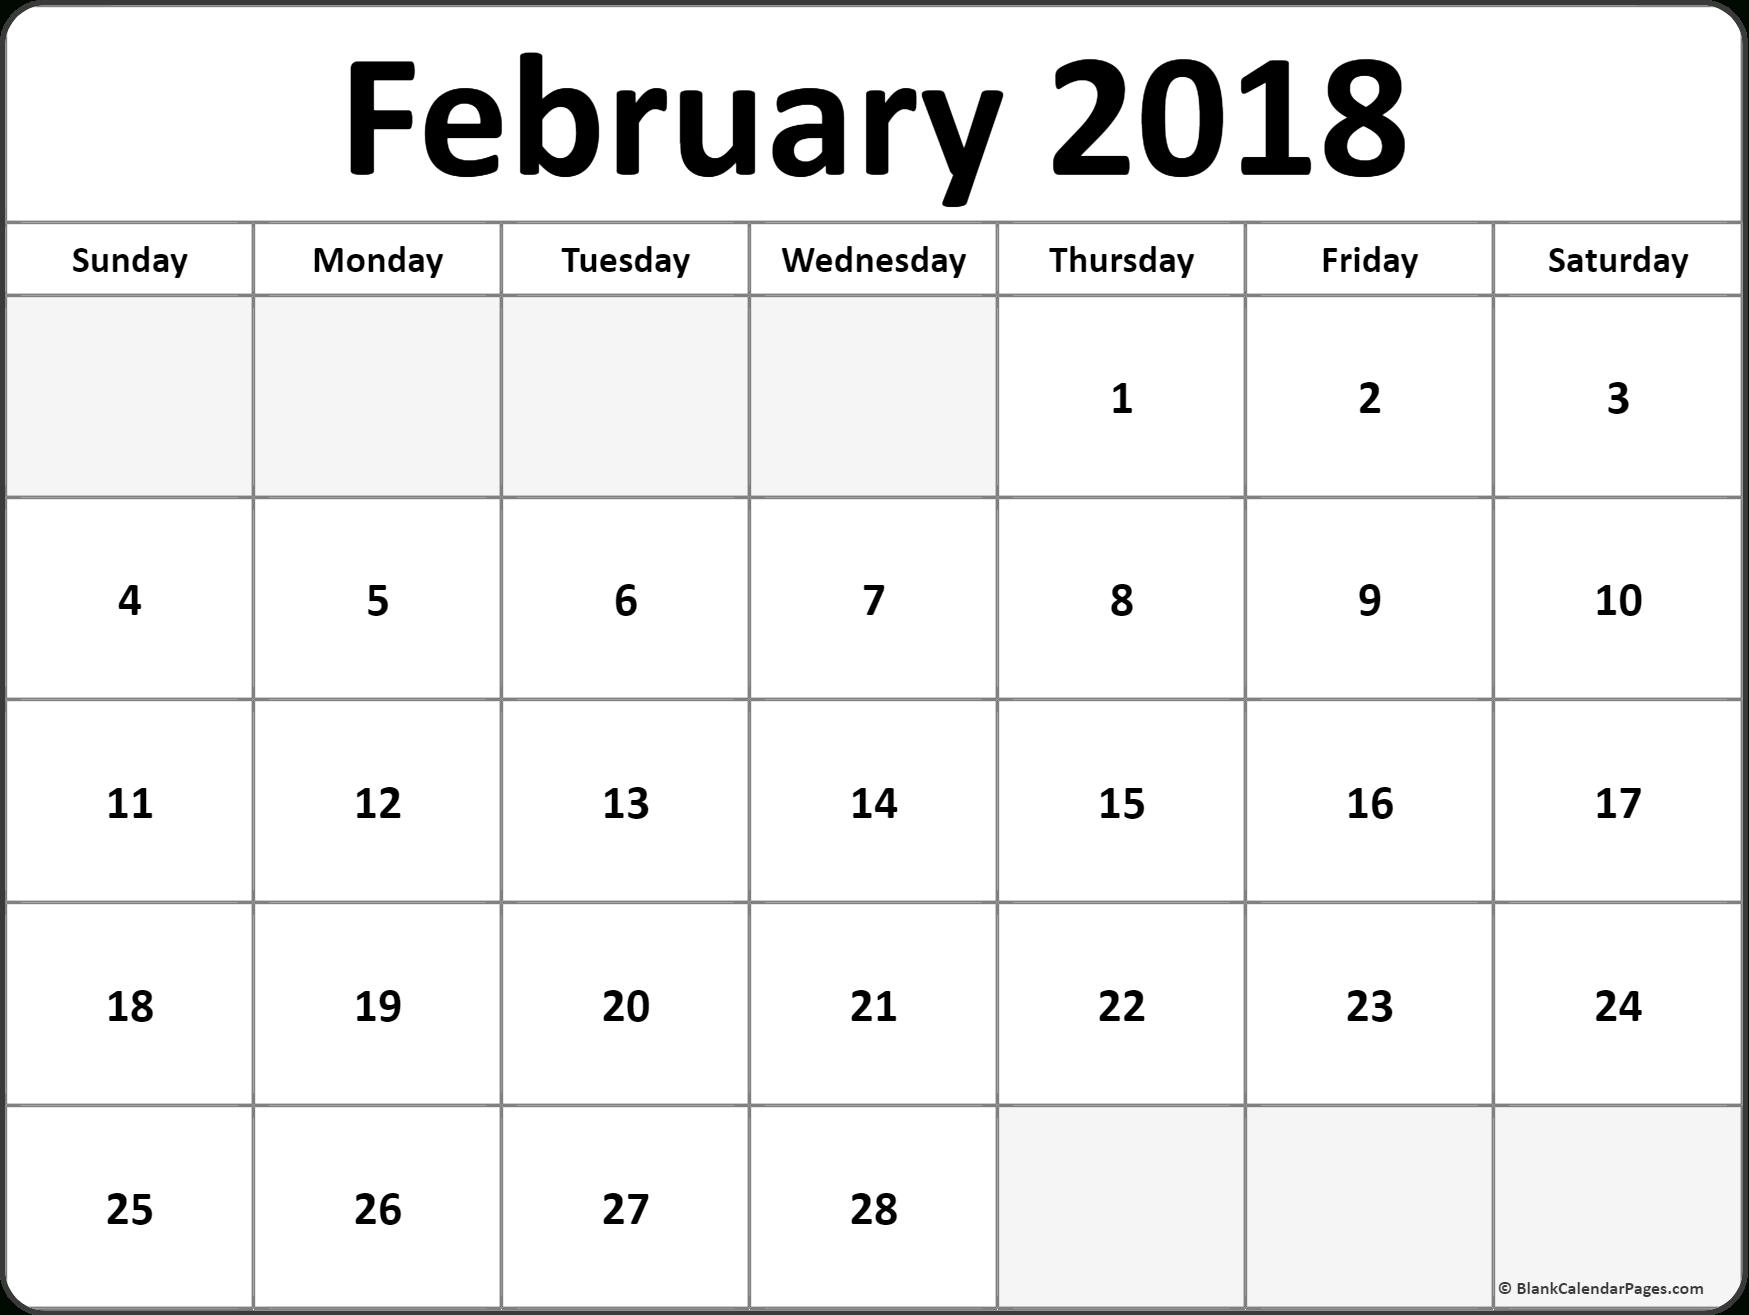 February 2018 Monthly Calendar Printout #printable #february intended for Full Size Blank Printable Calendar